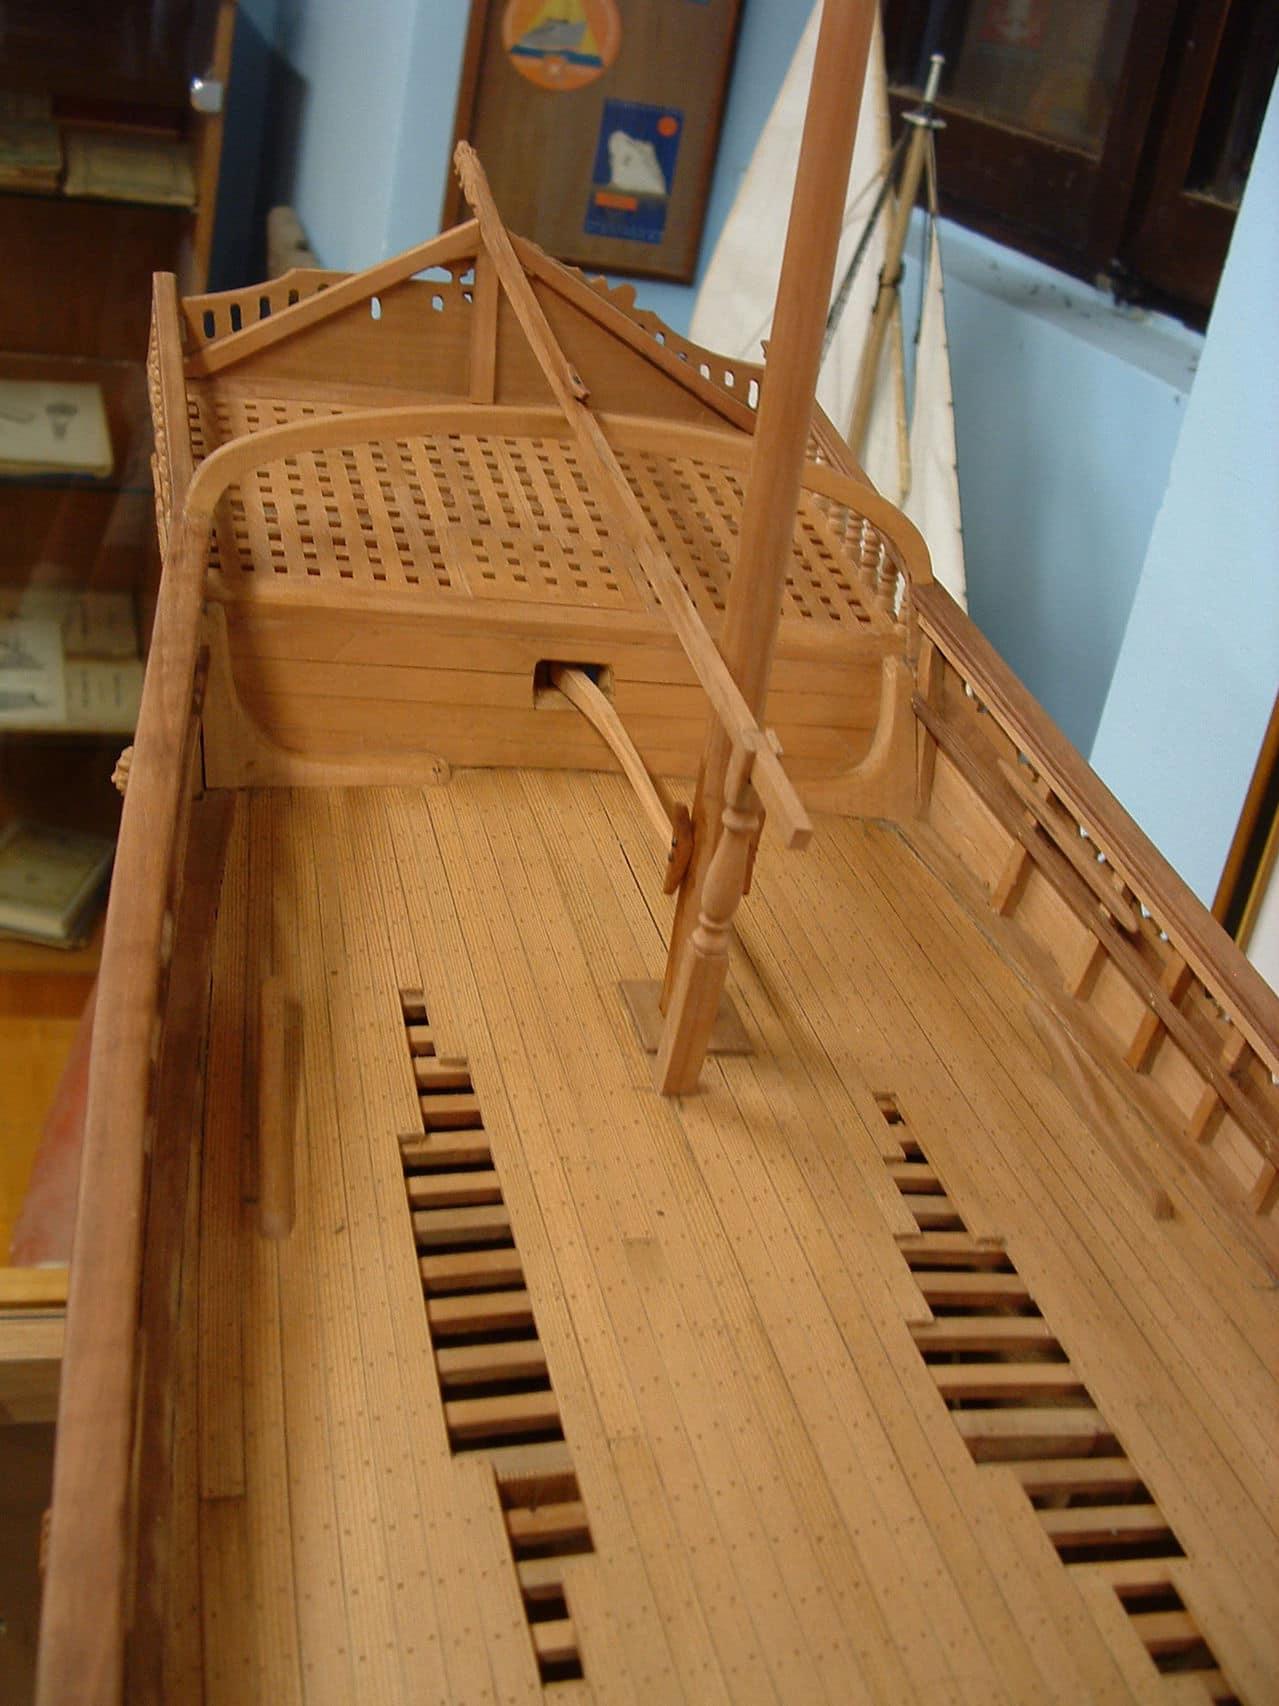 Chebec Le Requin - 1750 1216